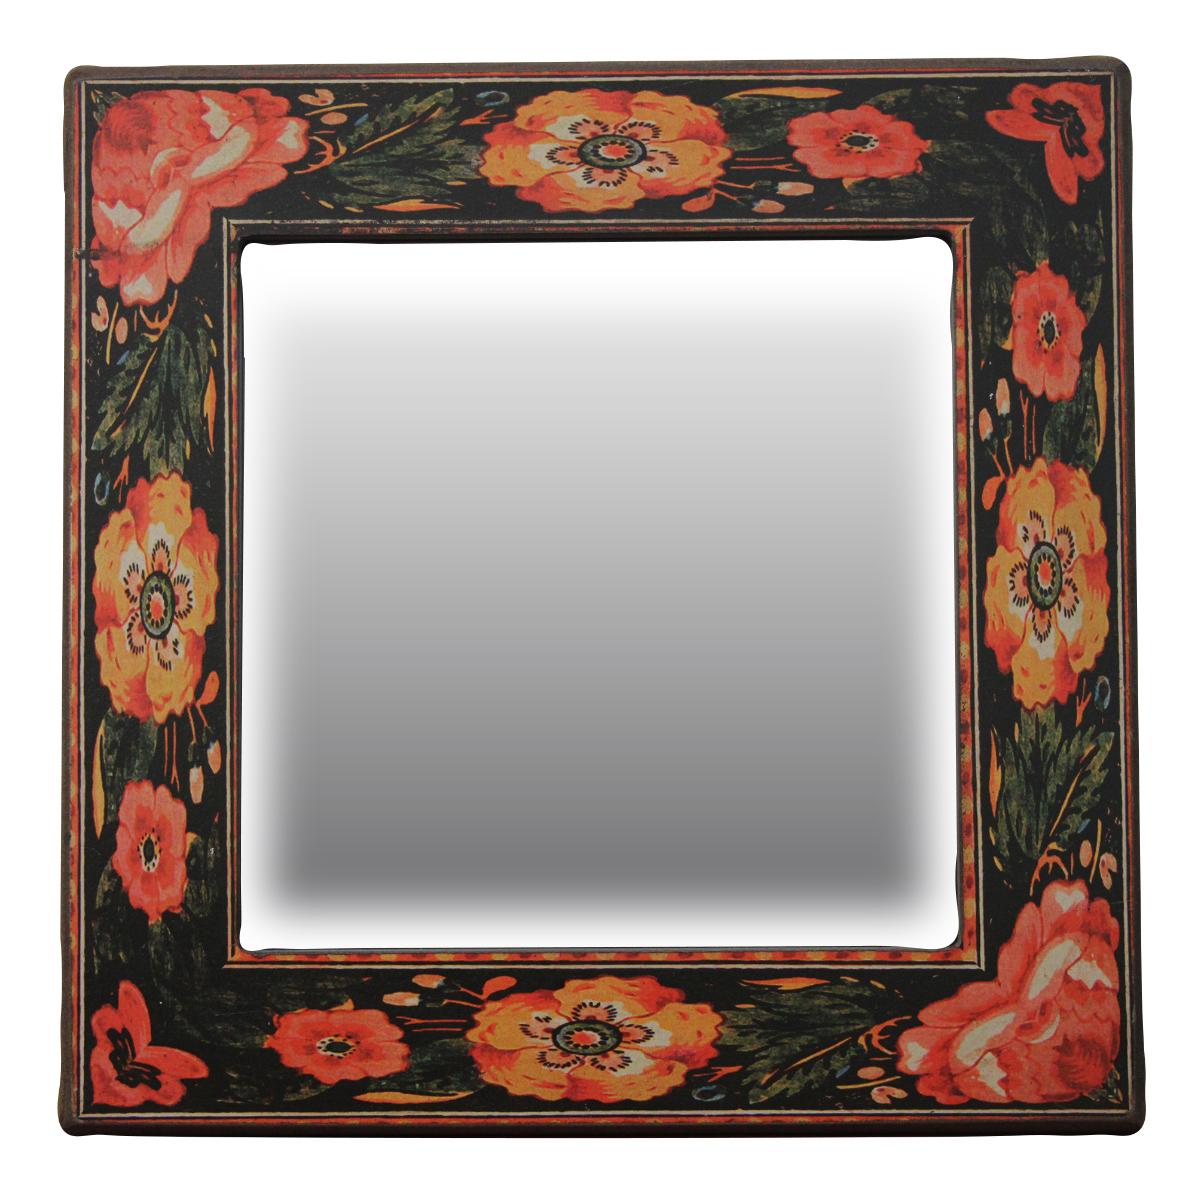 آینه چوبی کد 398.1